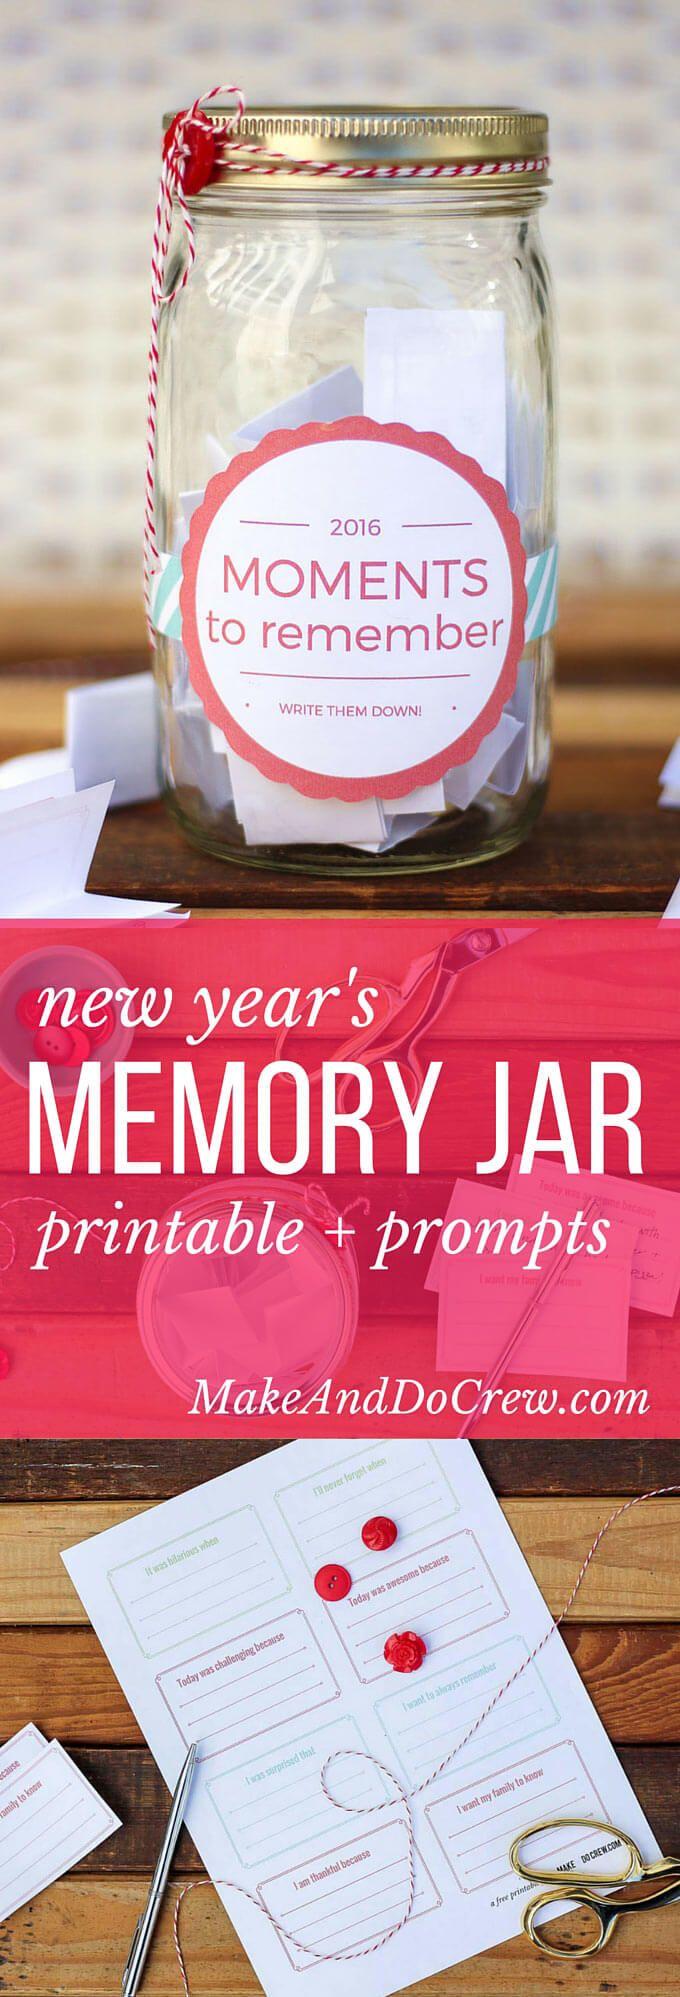 How To Make a Memory Jar